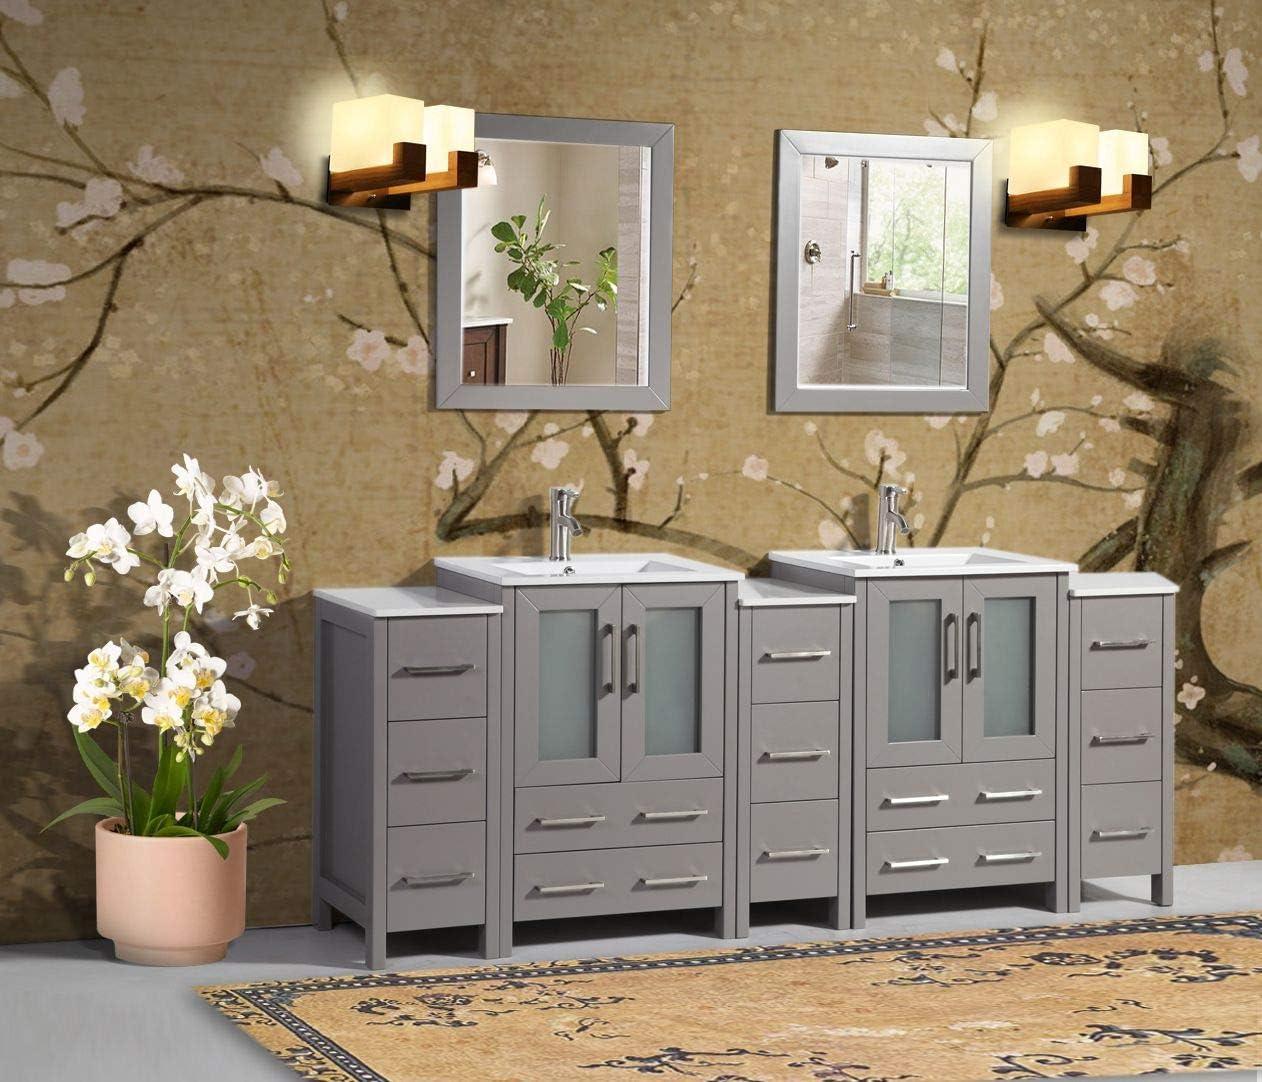 Buy Vanity Art 84 Inch Double Sink Bathroom Vanity Combo Set 3 Side Cabinets 2 Shelves 13 Dove Tailed Drawers Ceramic Top Bathroom Cabinet With Free Mirror Va3024 84 G Online In Turkey B01jrl9om2